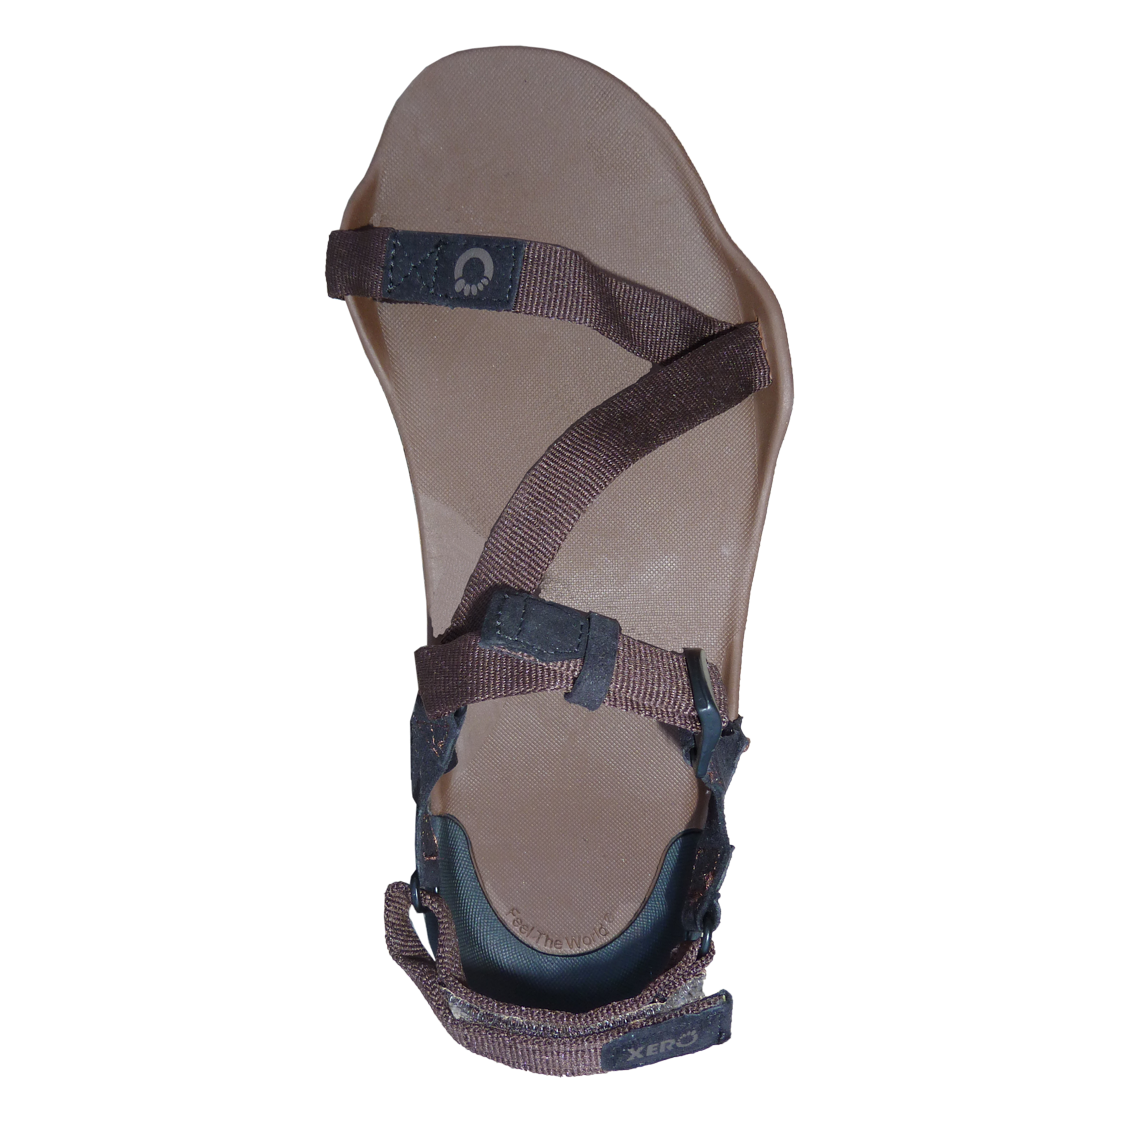 Cool Xero Shoes Amuri ZTrek Lightweight Sport Sandal  Men  EBay